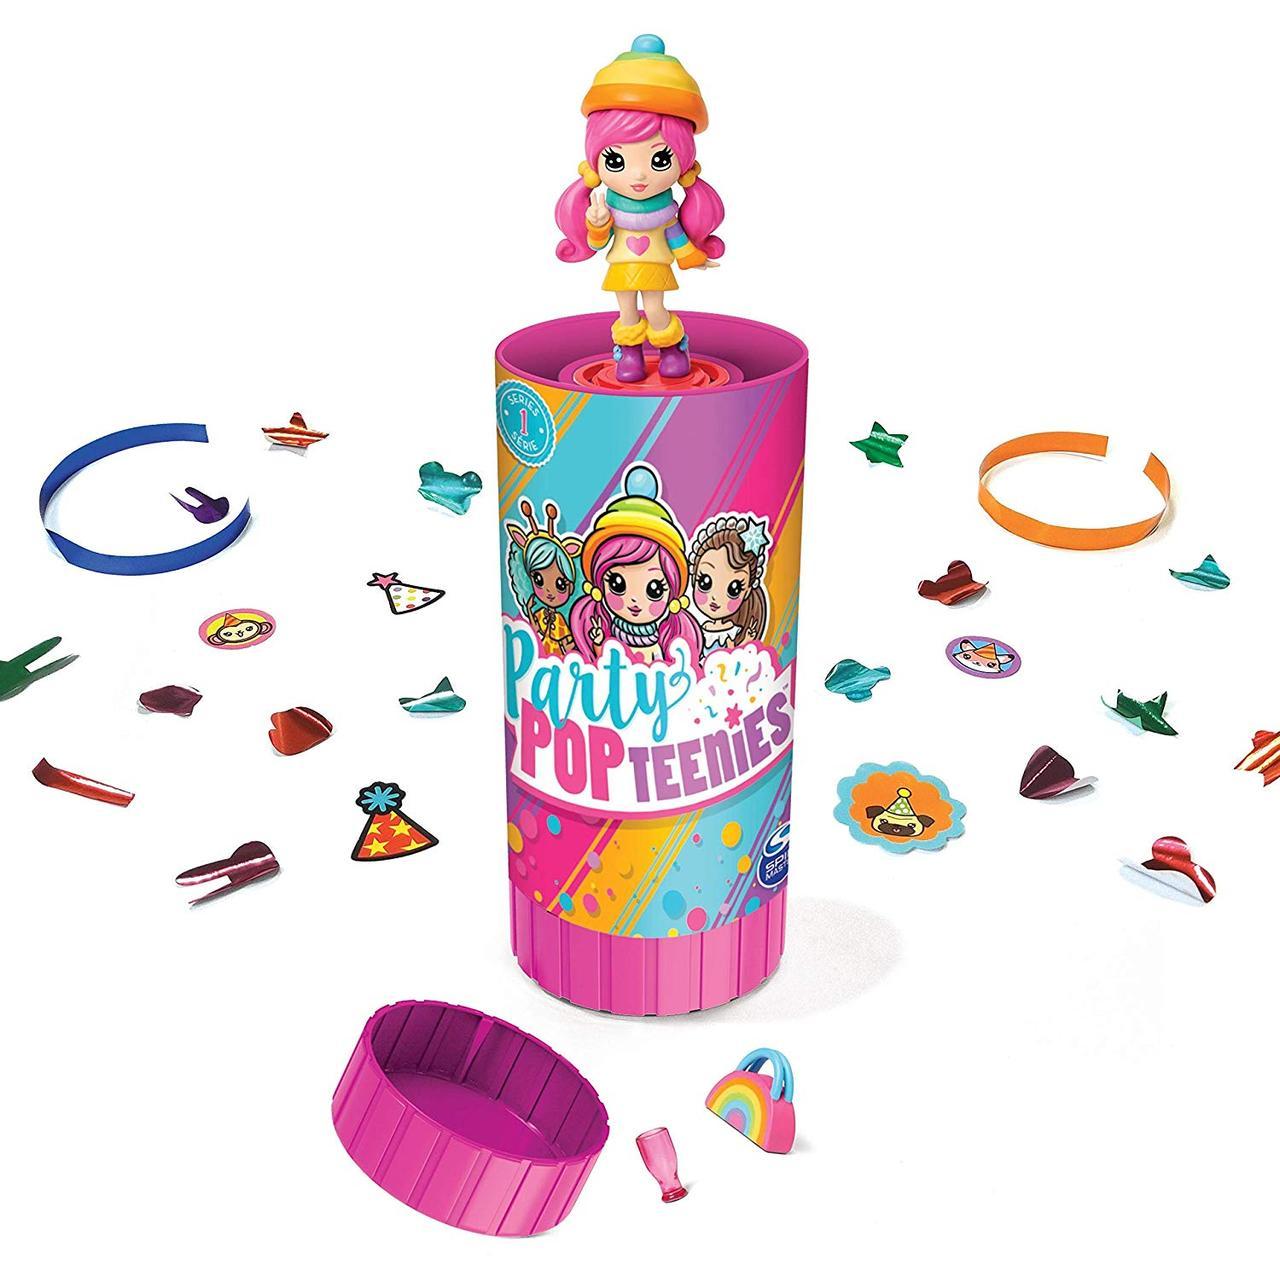 Набор 1 штука Party Popteenies: куколка хлопушка – сюрприз, Spin Master из США